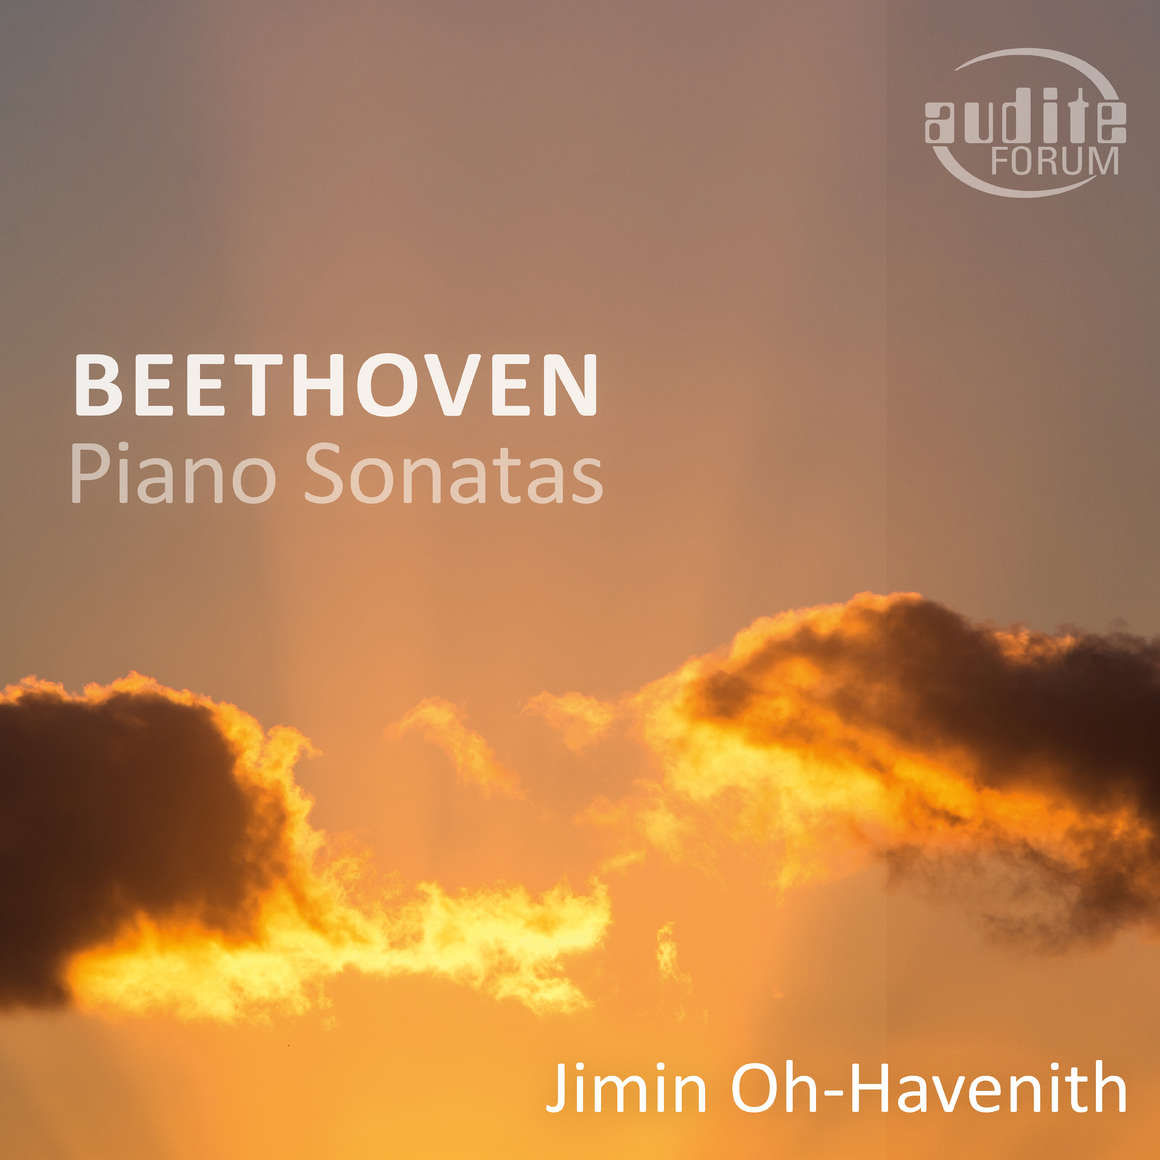 Jimin Oh-Havenith  - Beethoven - Piano Sonatas